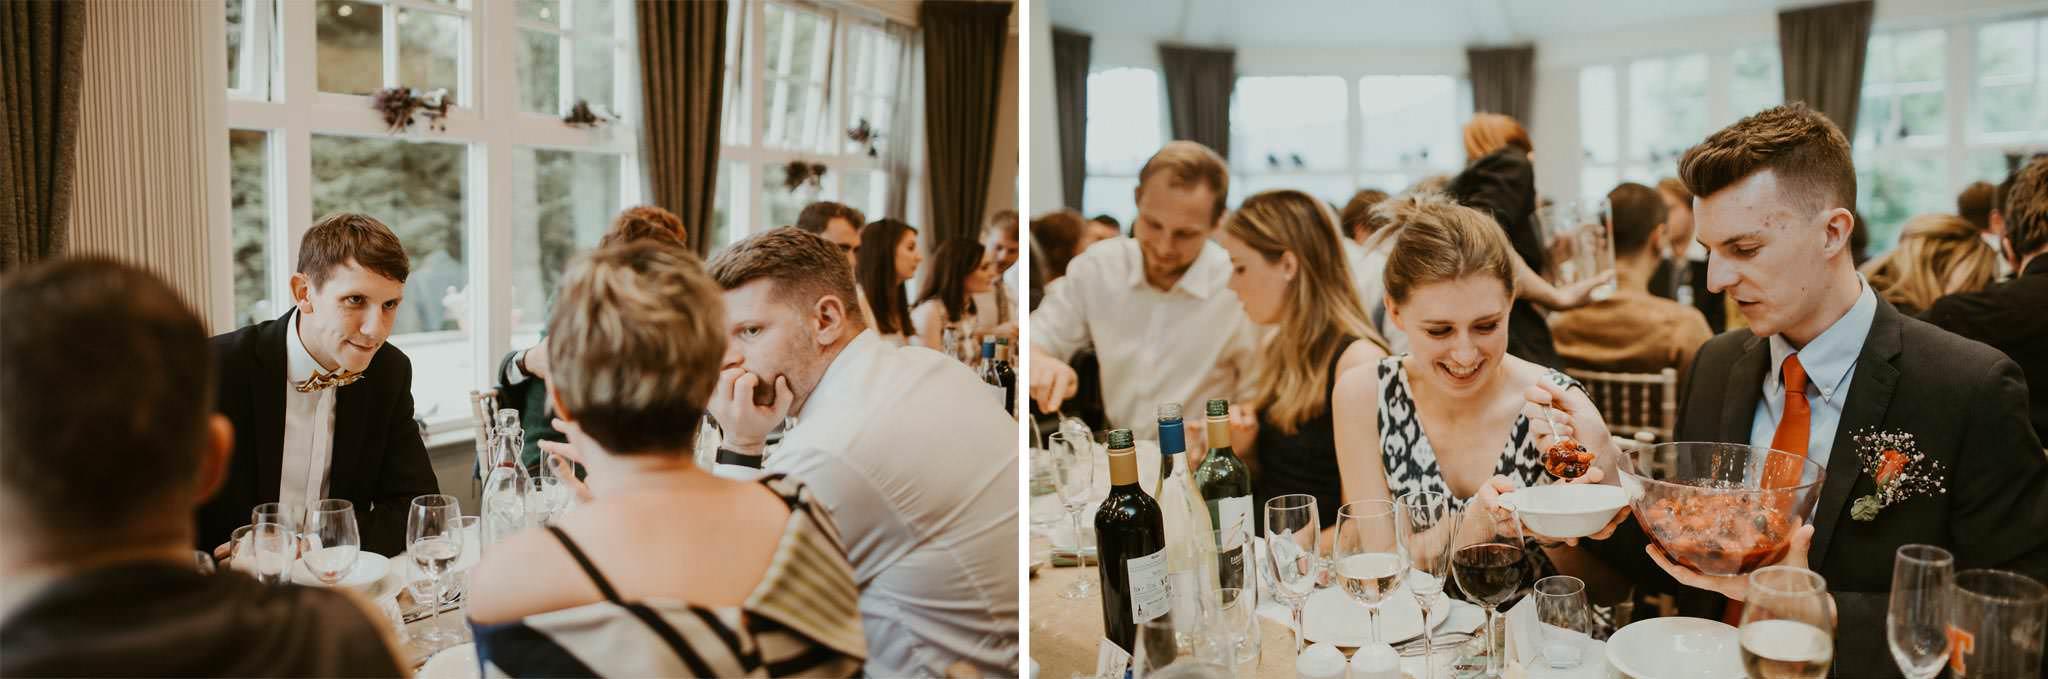 scotland-wedding-photographer-167